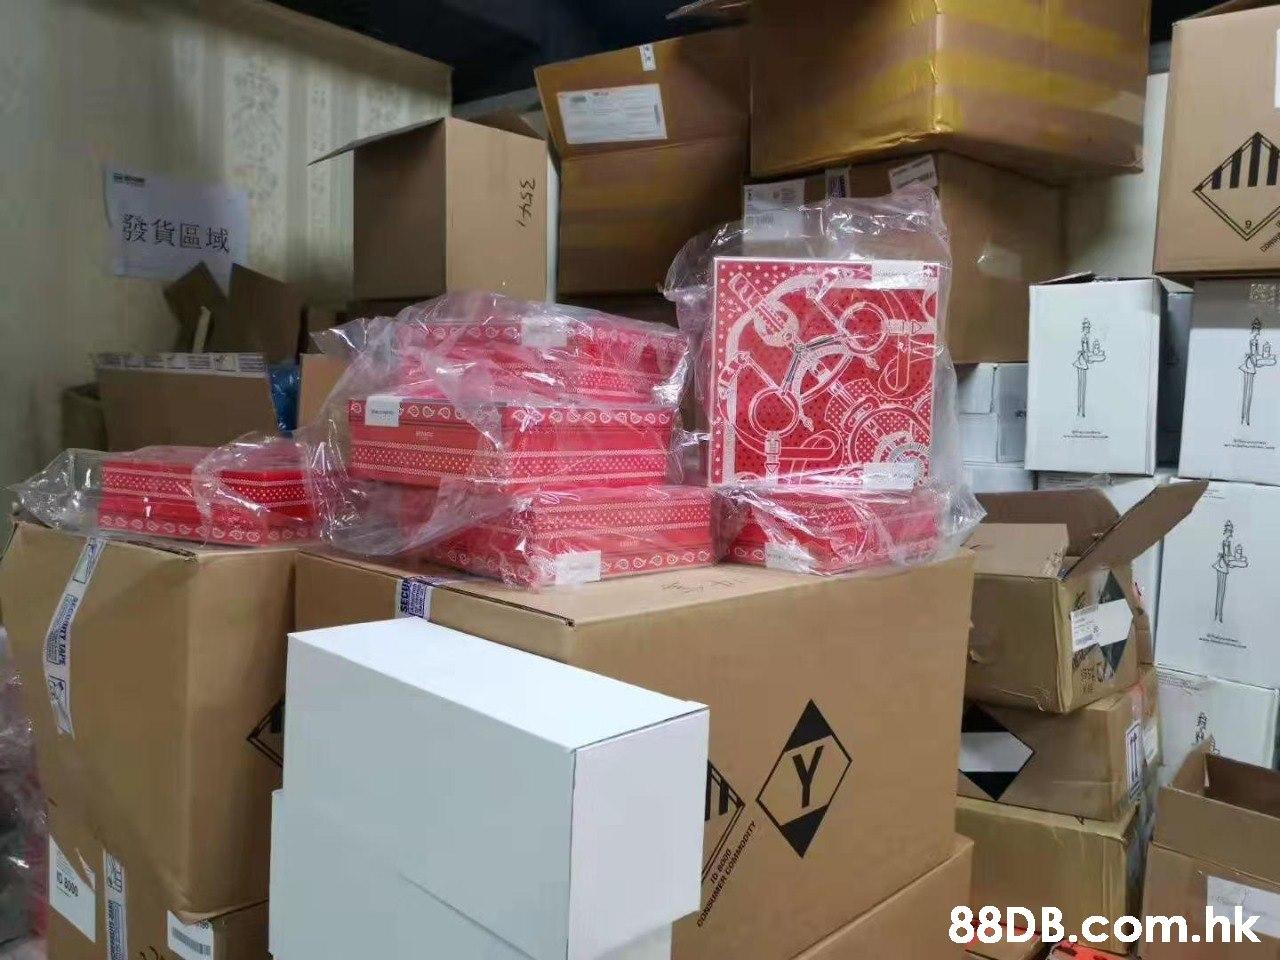 發貨區域 AЬ DORS .hk 354,  Carton,Material property,Box,